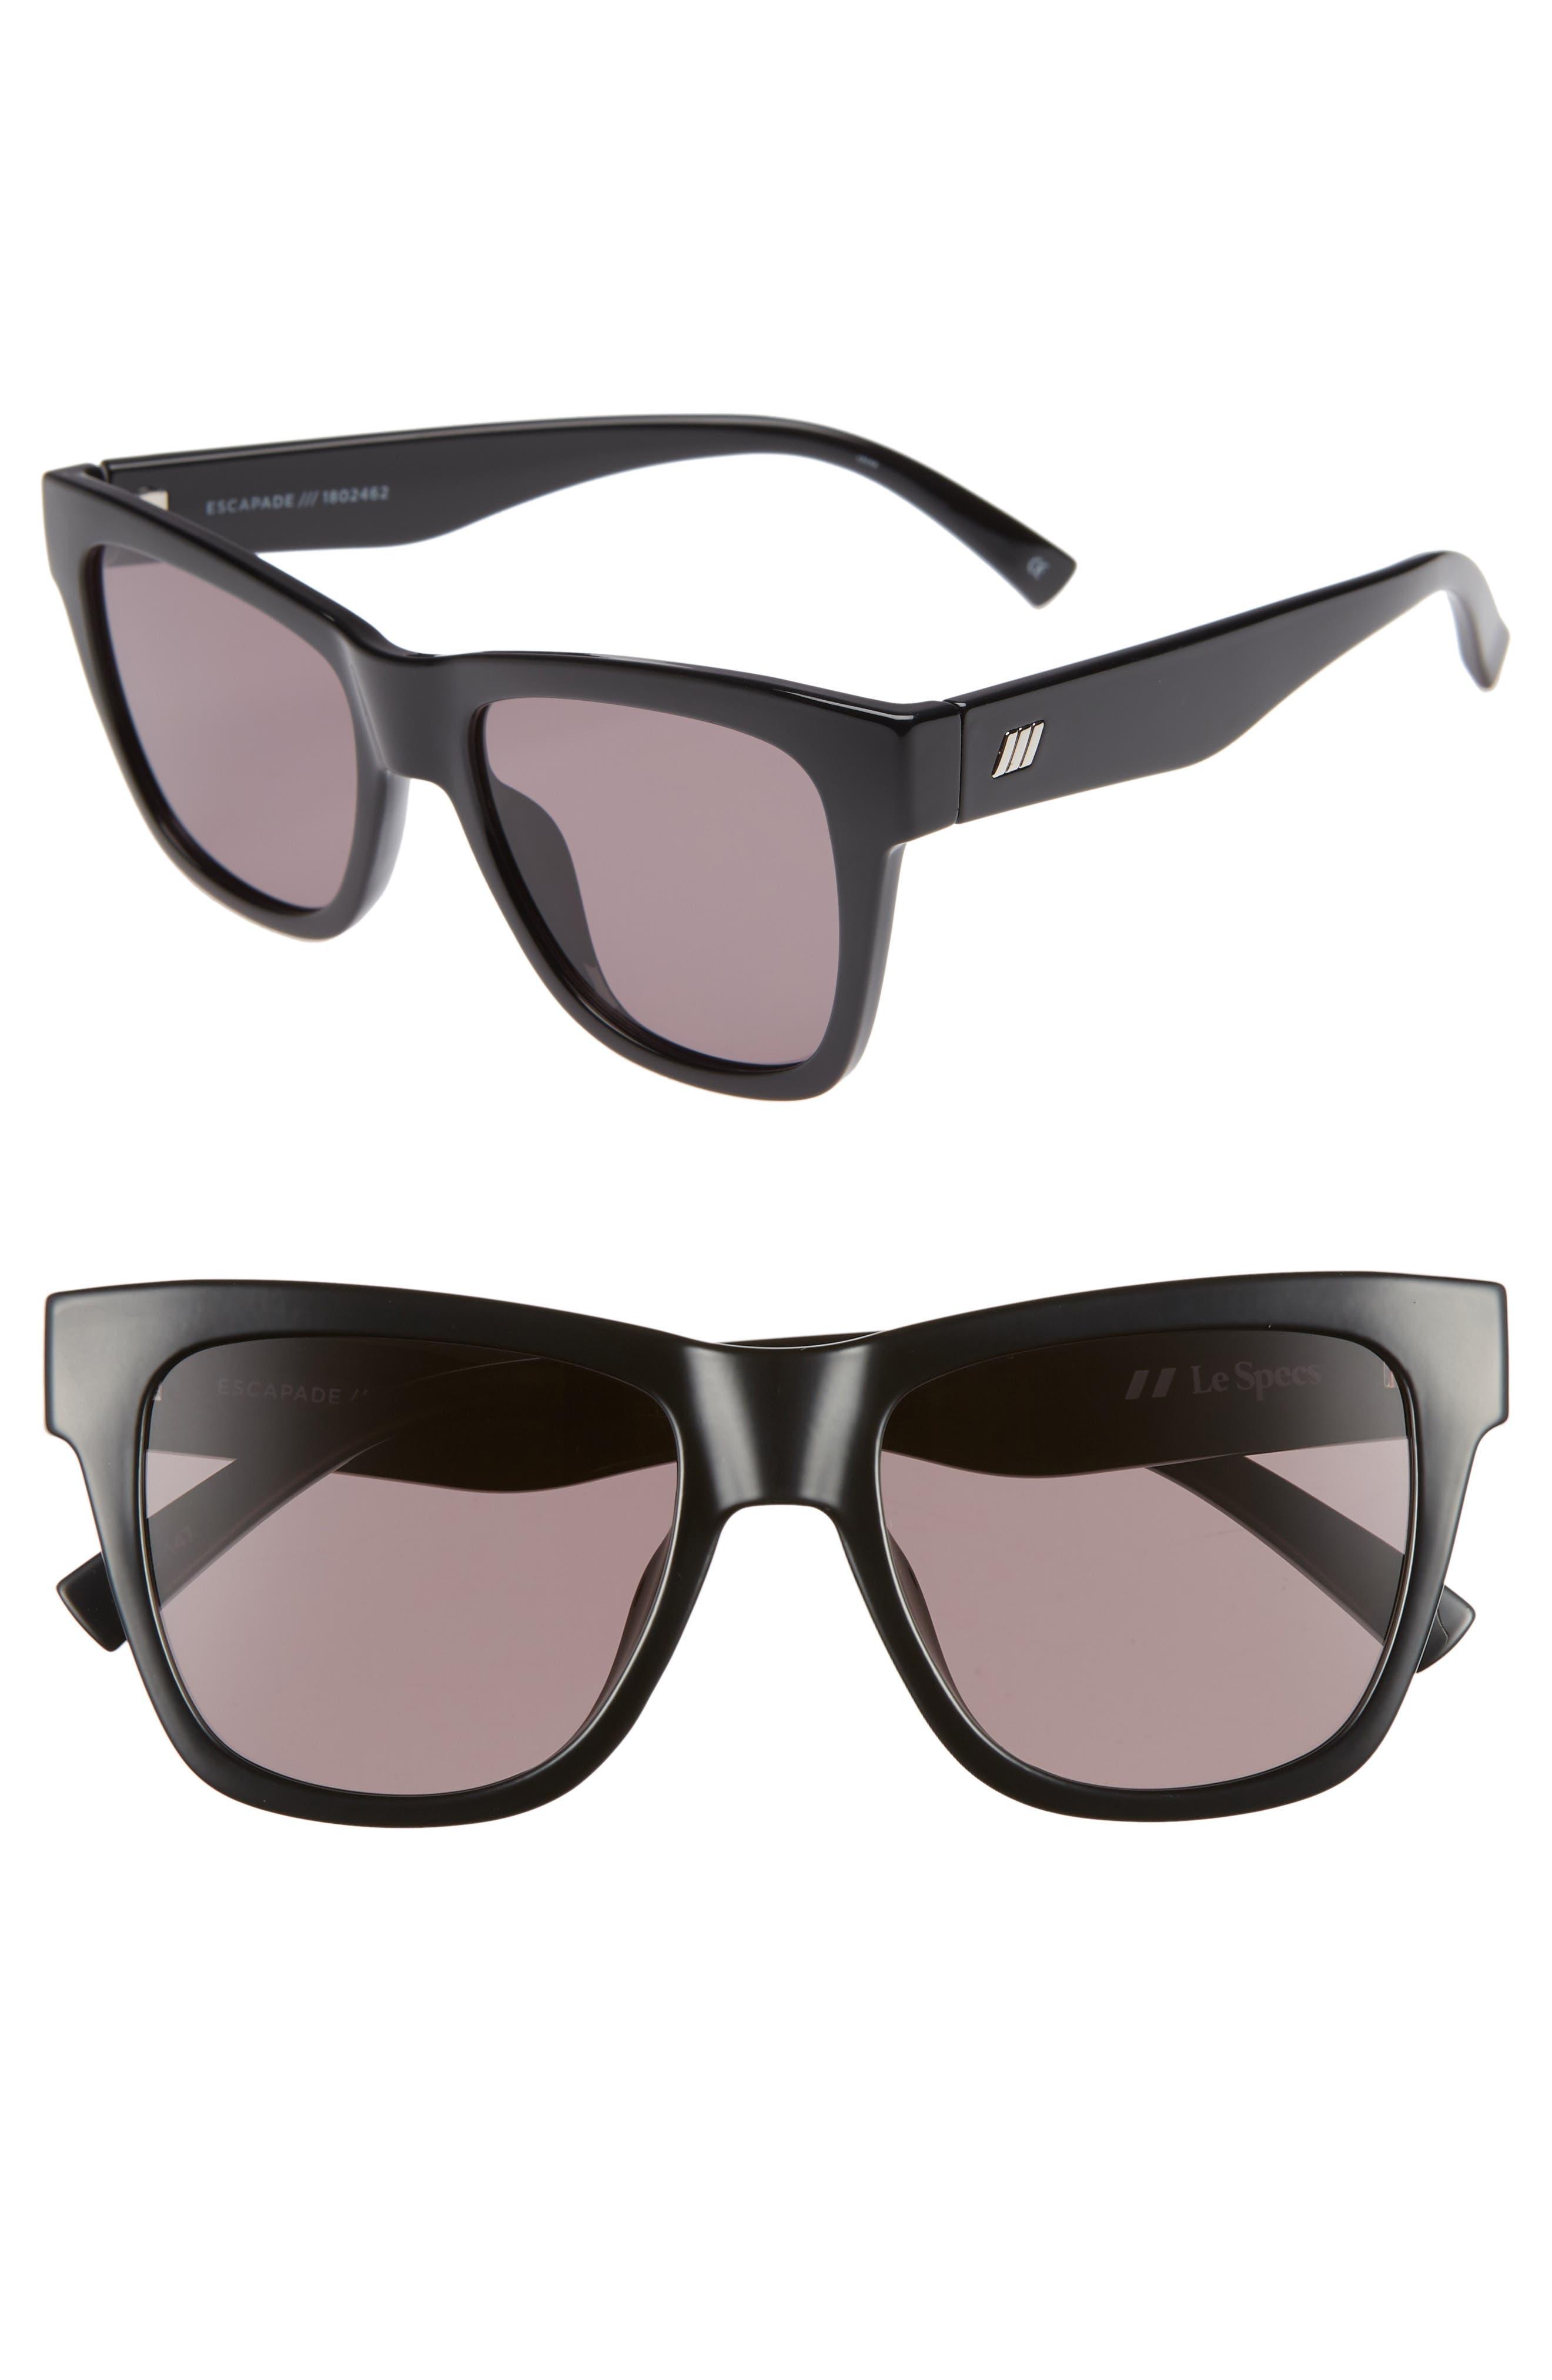 Escapade 54mm Sunglasses,                             Main thumbnail 1, color,                             BLACK